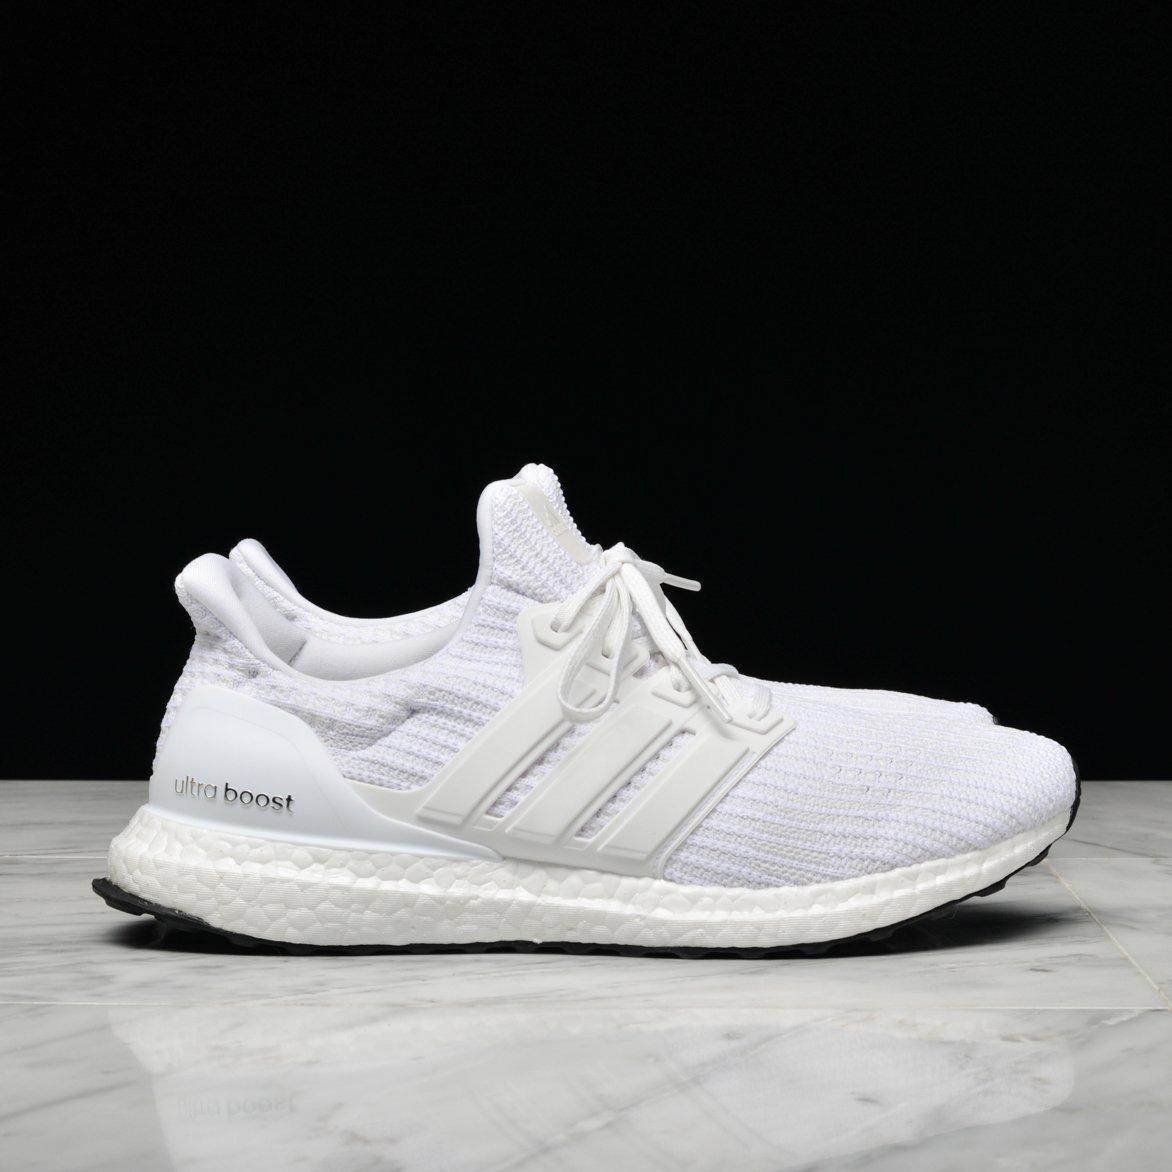 0718f8234bc Sneaker Shouts™ on Twitter